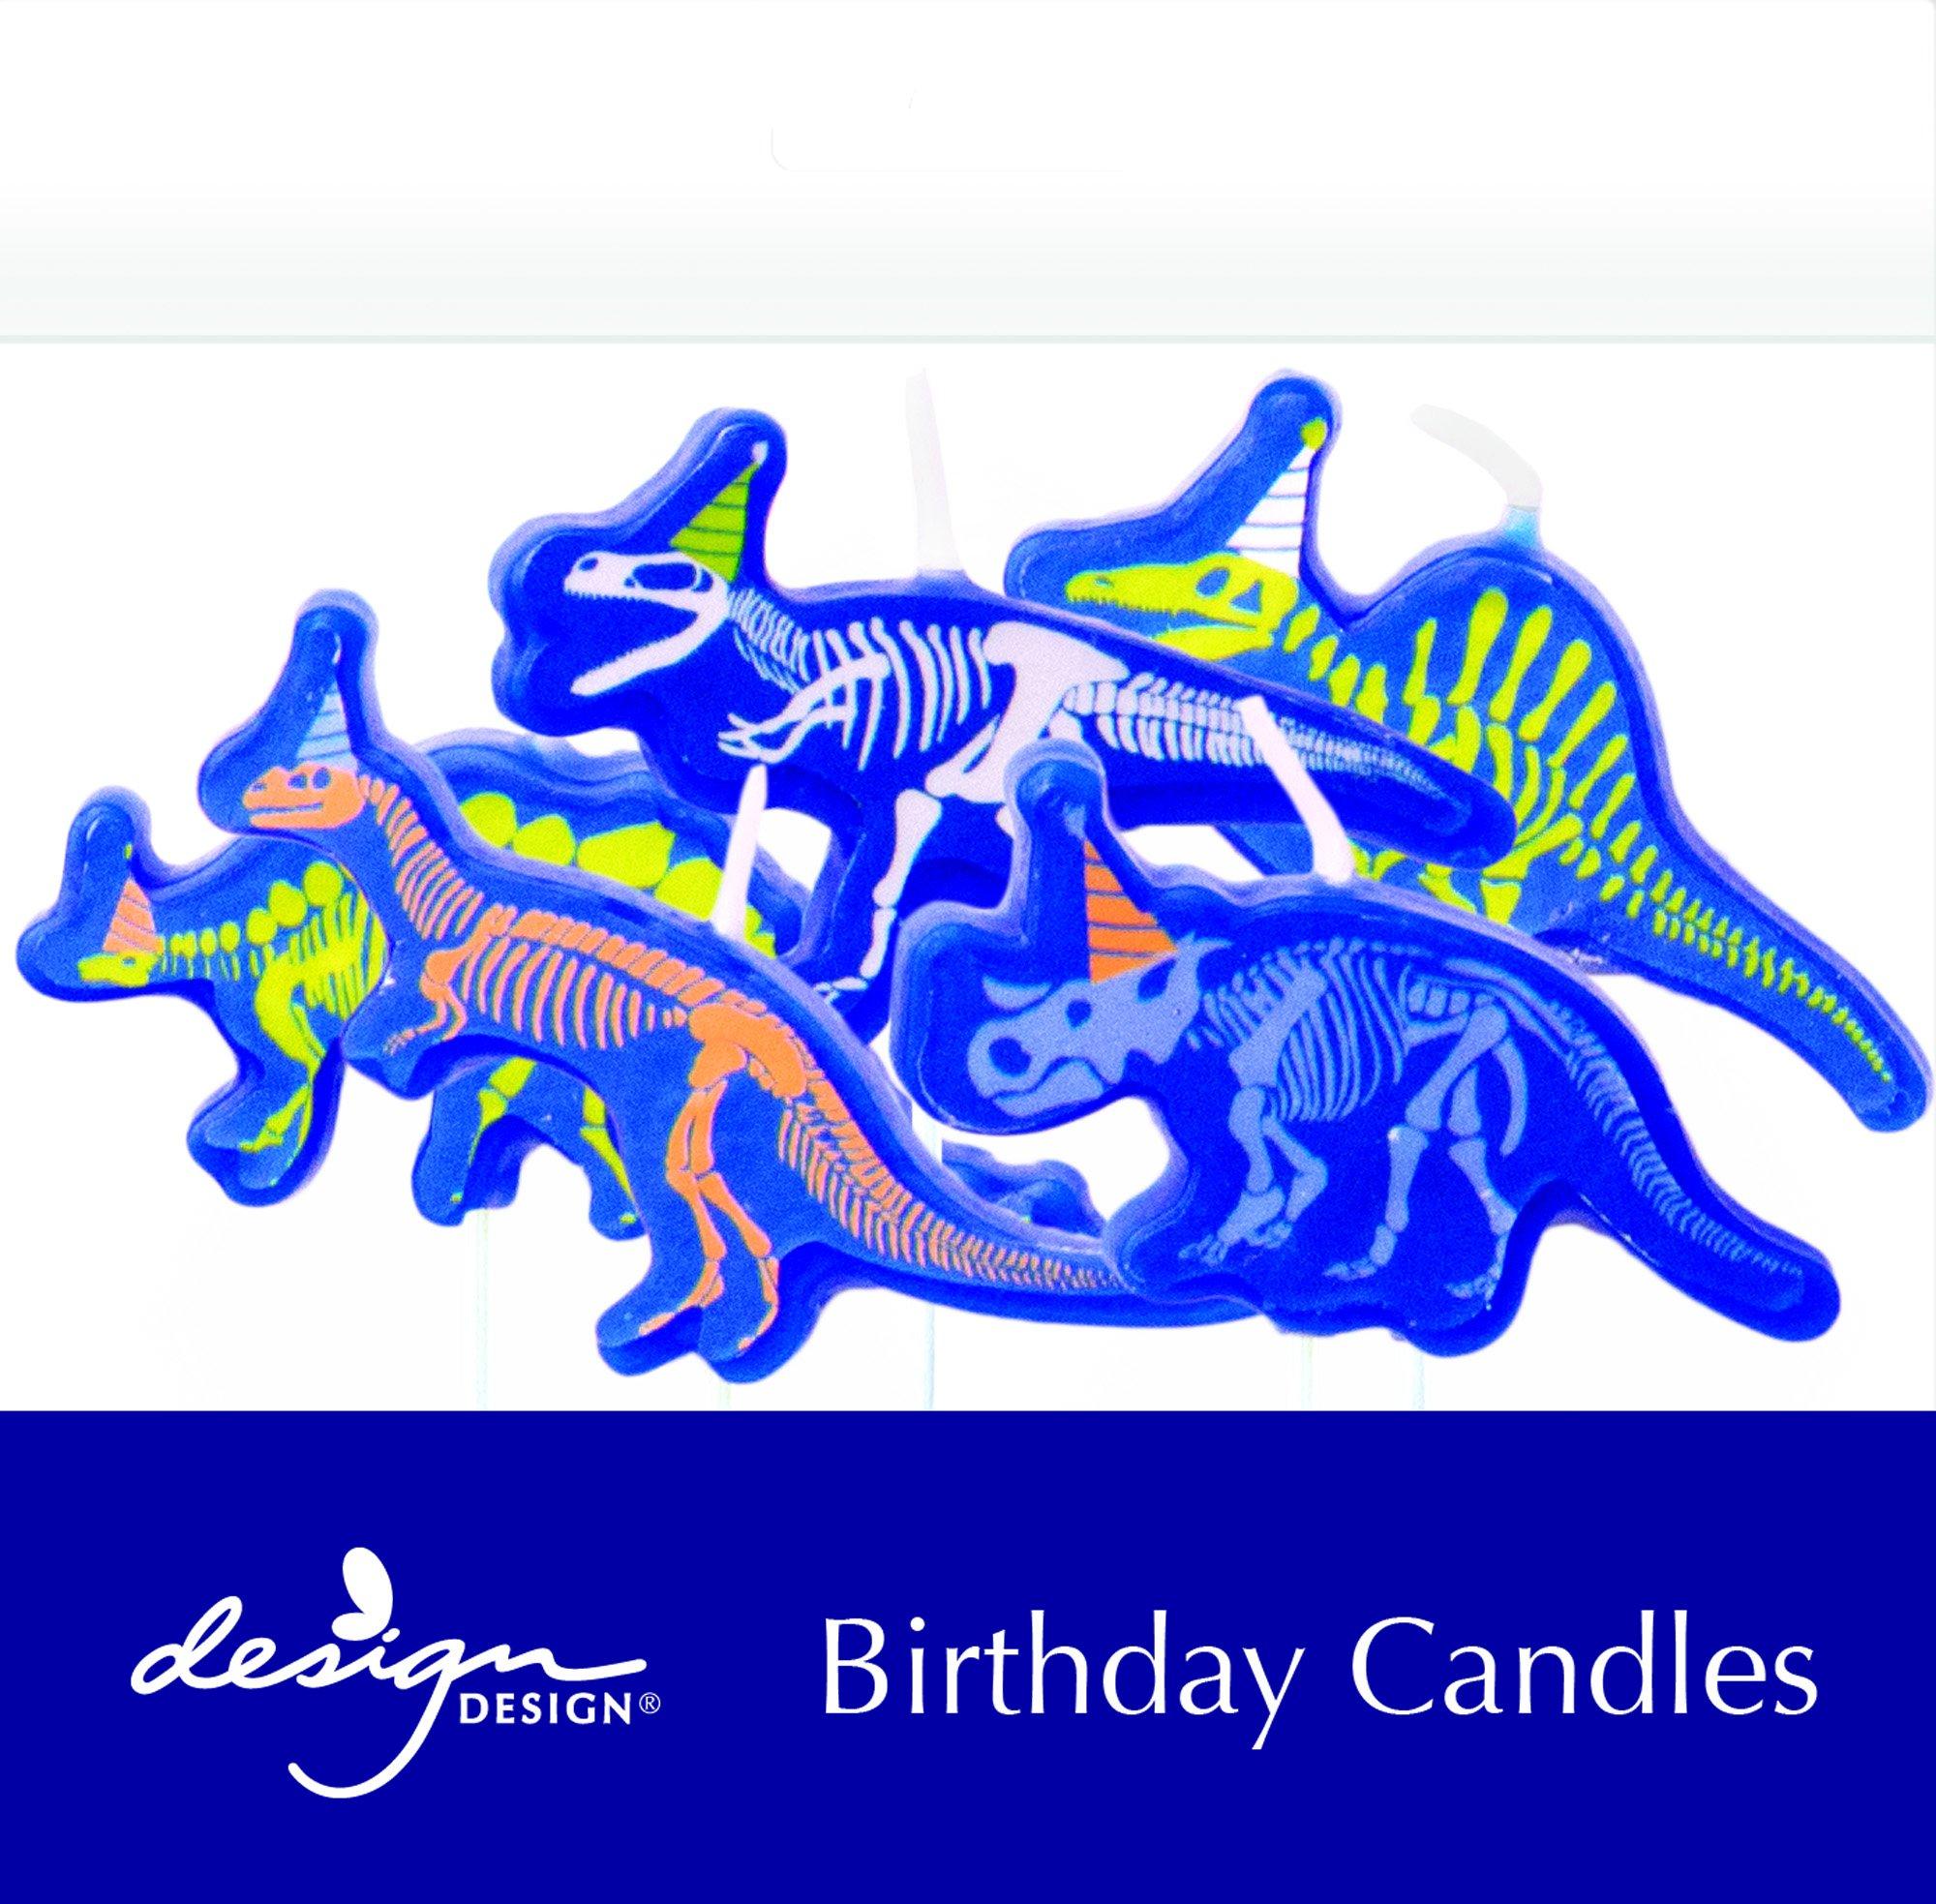 Design Design 758-08917 Dino-Mite Birthday Candles Sculpted, Multicolor